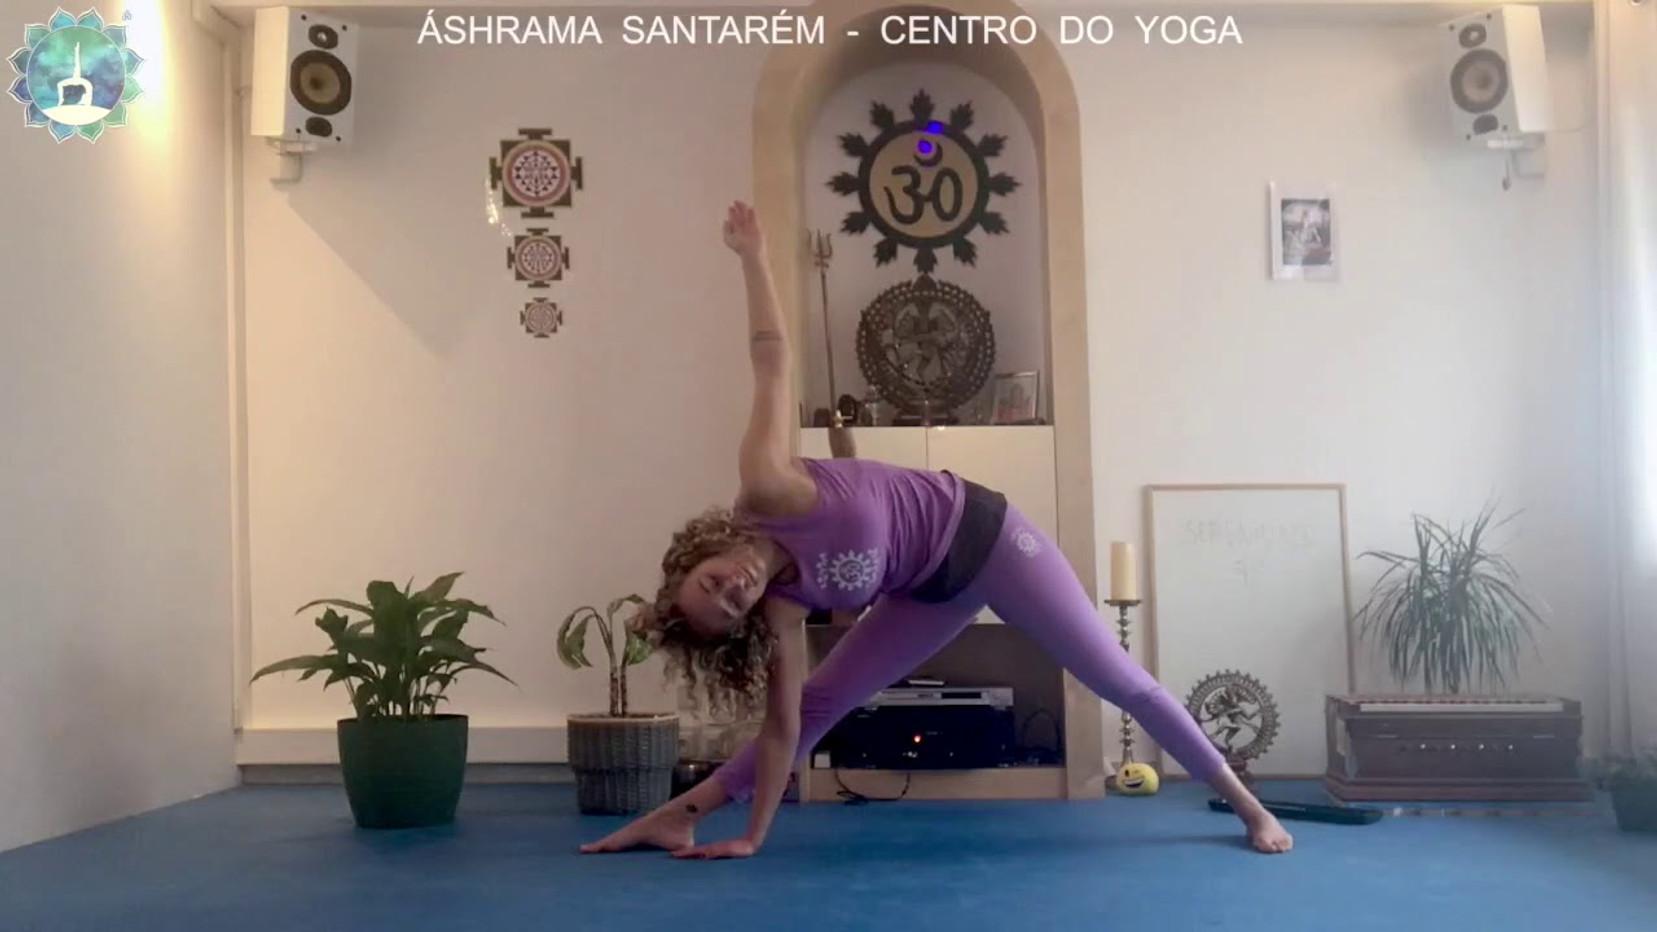 Aula de Yoga Nº 5 - Short Preview